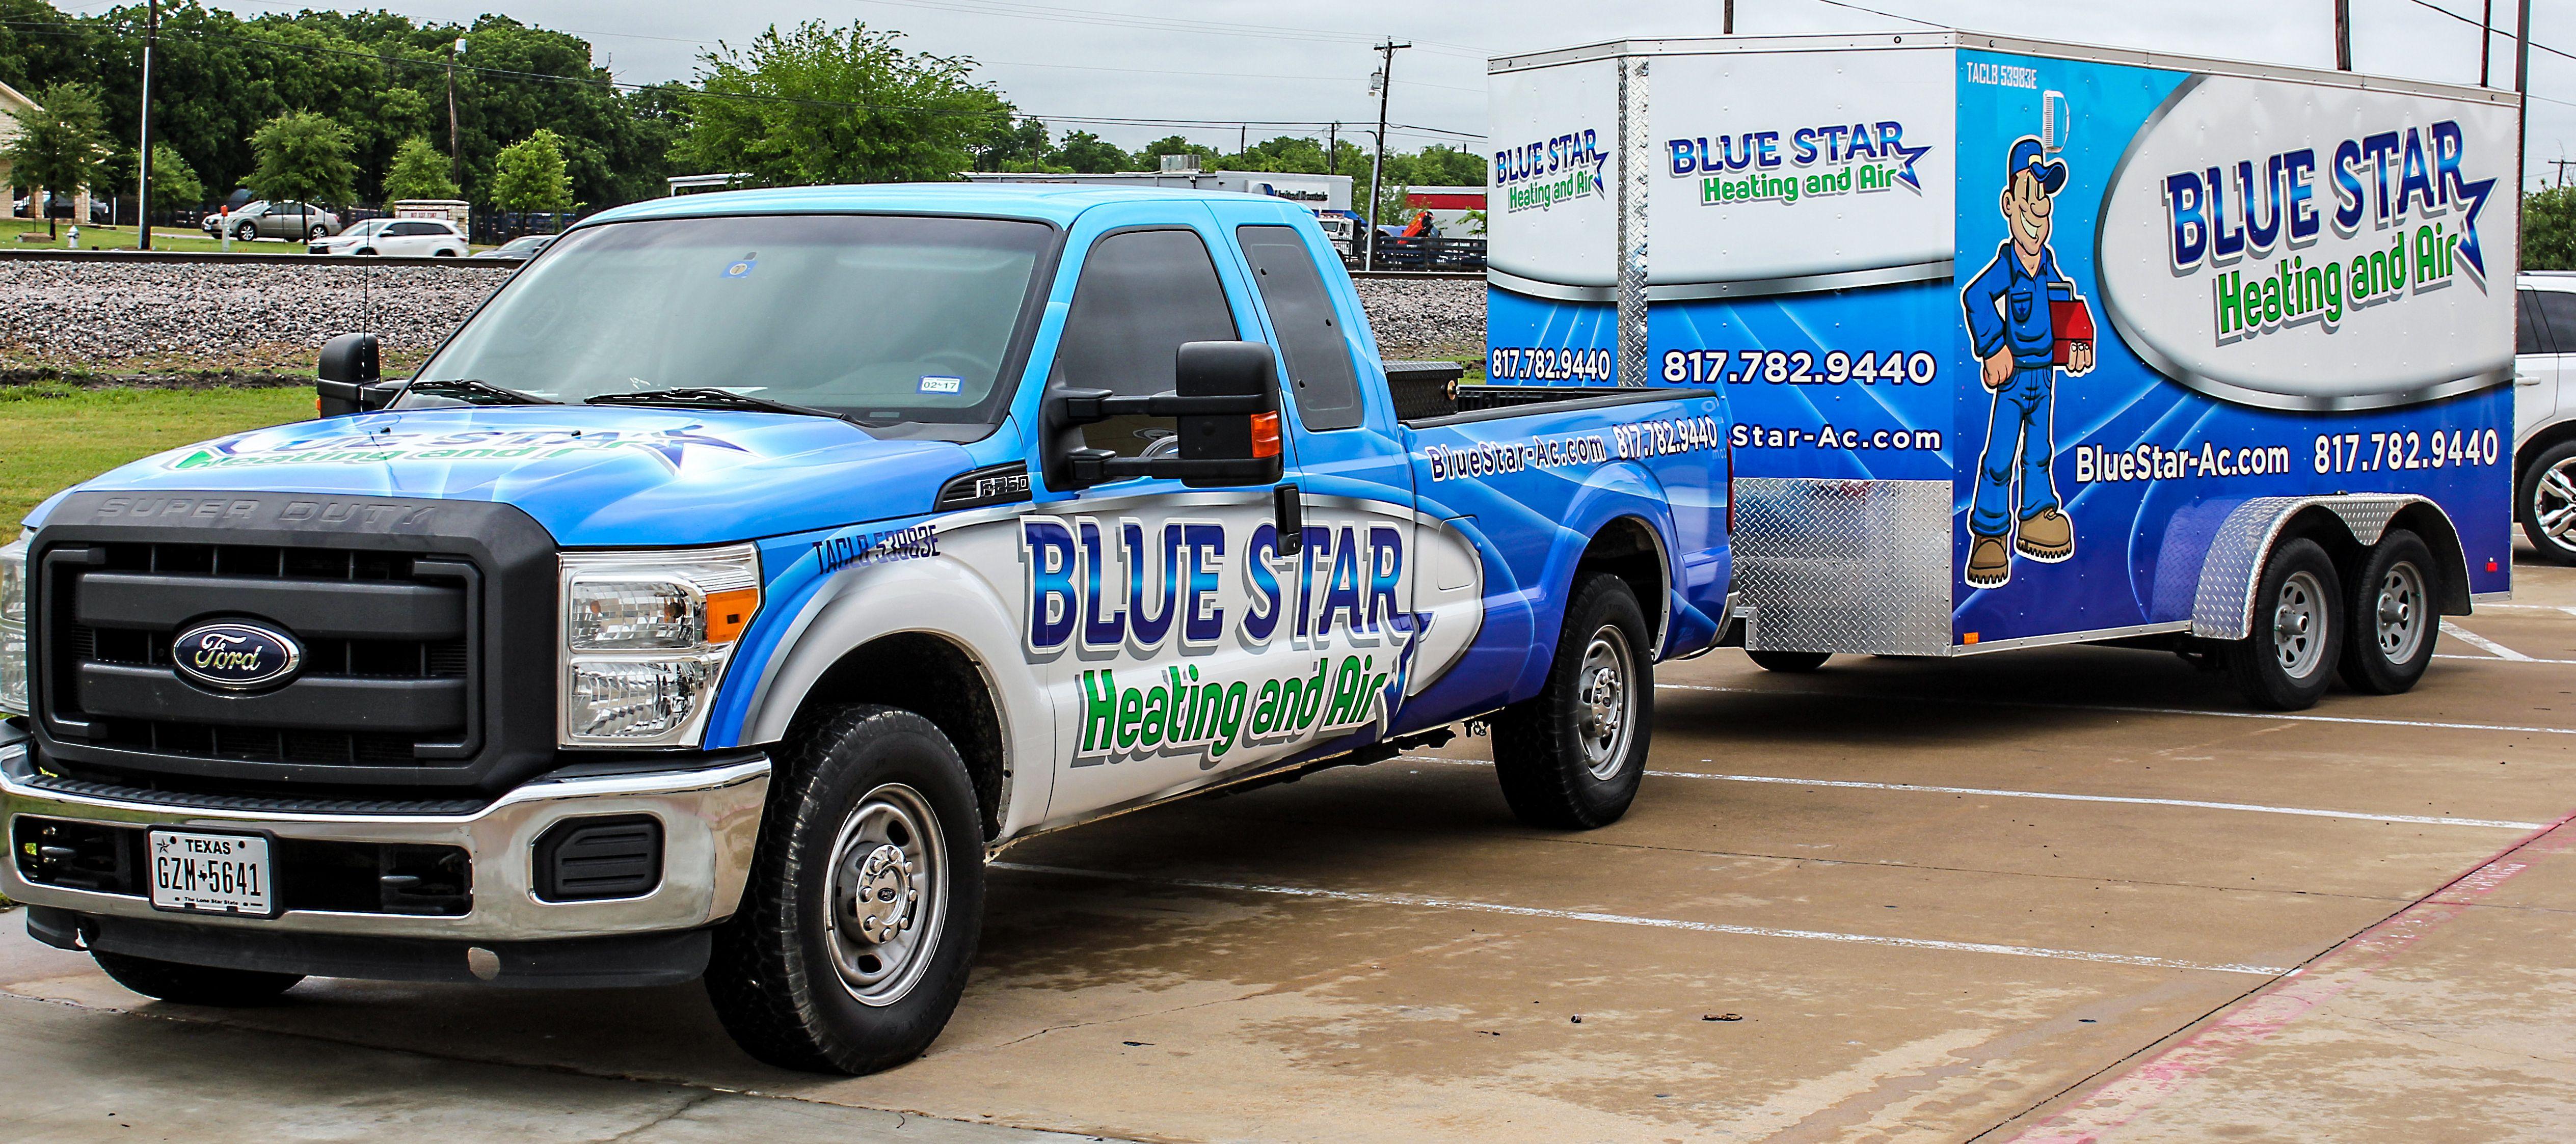 Advertise HVAC company on trucks & trailers